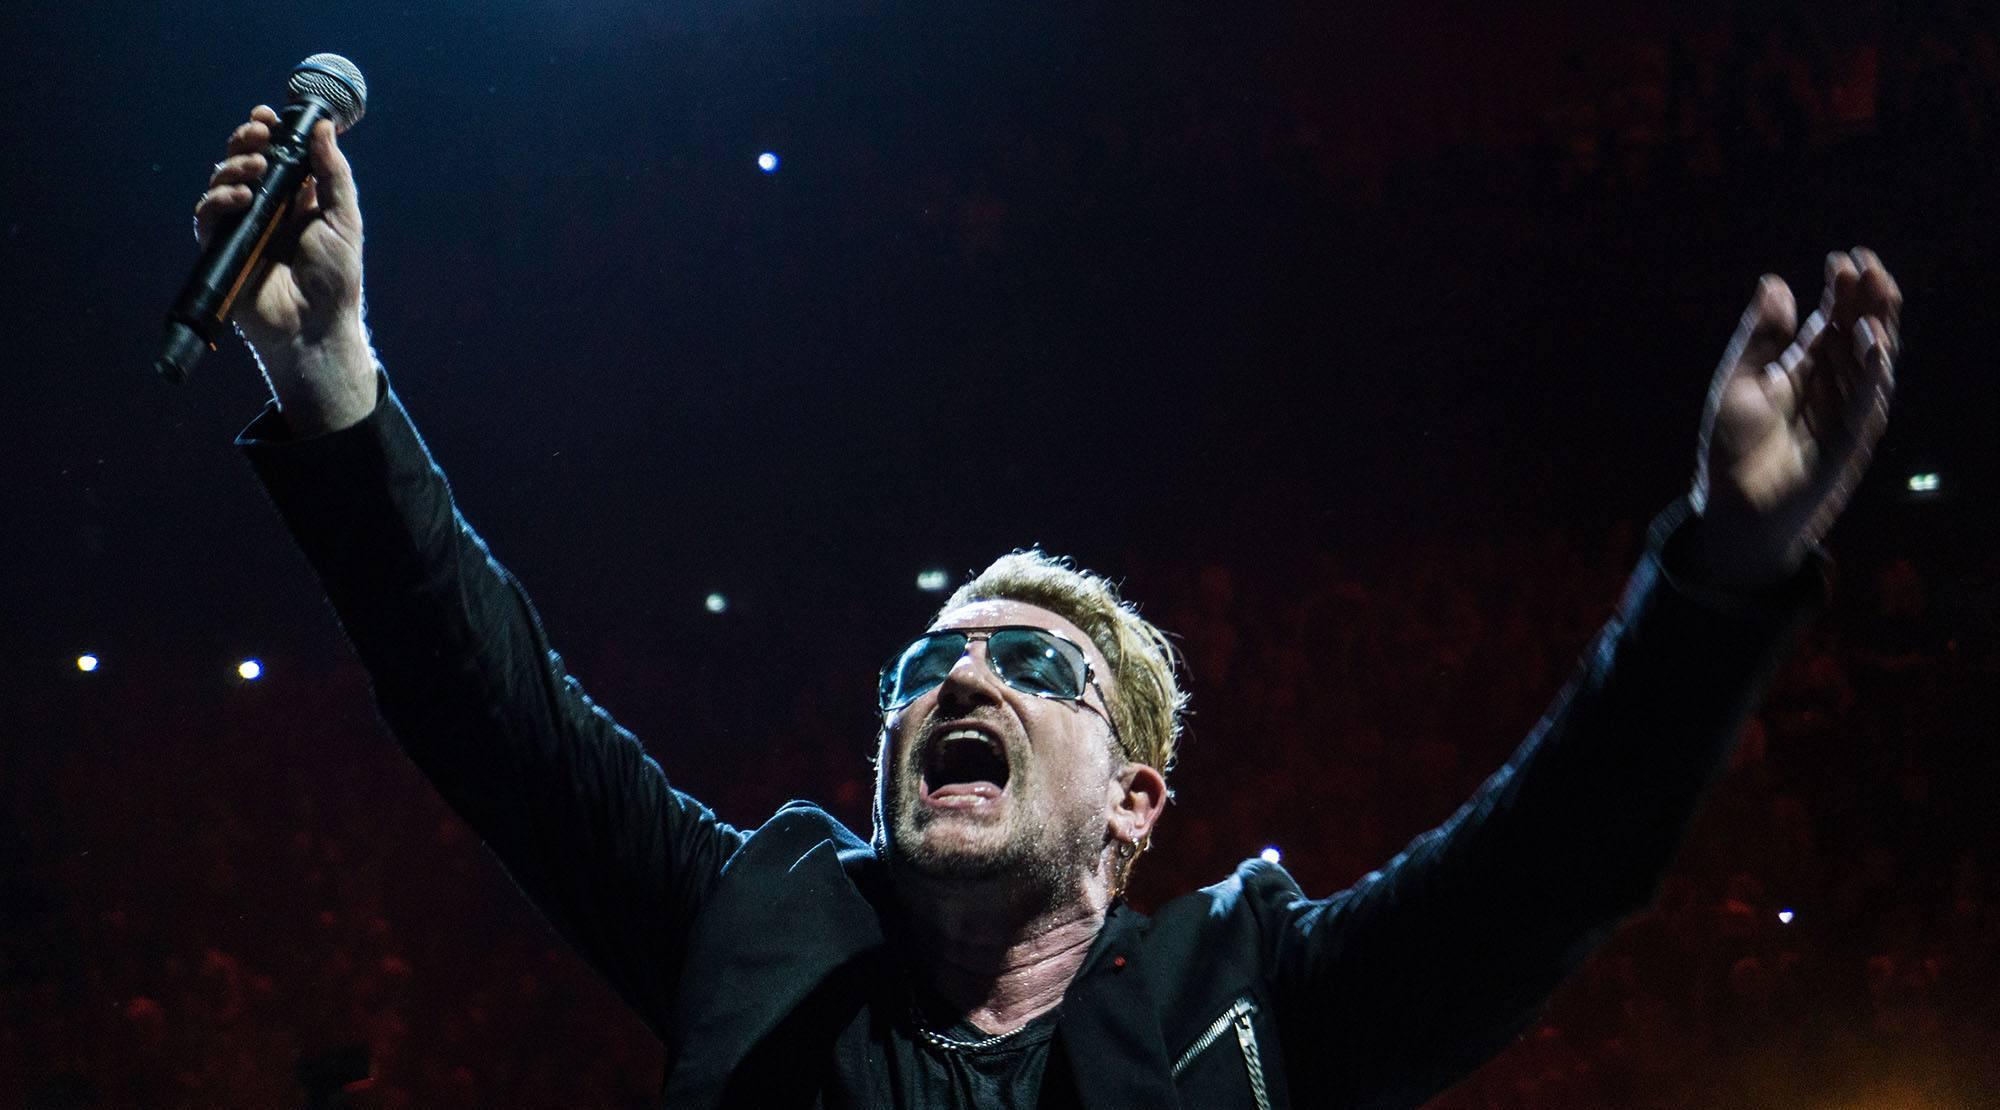 Bono of u2 performing in paris u2start remy flickr